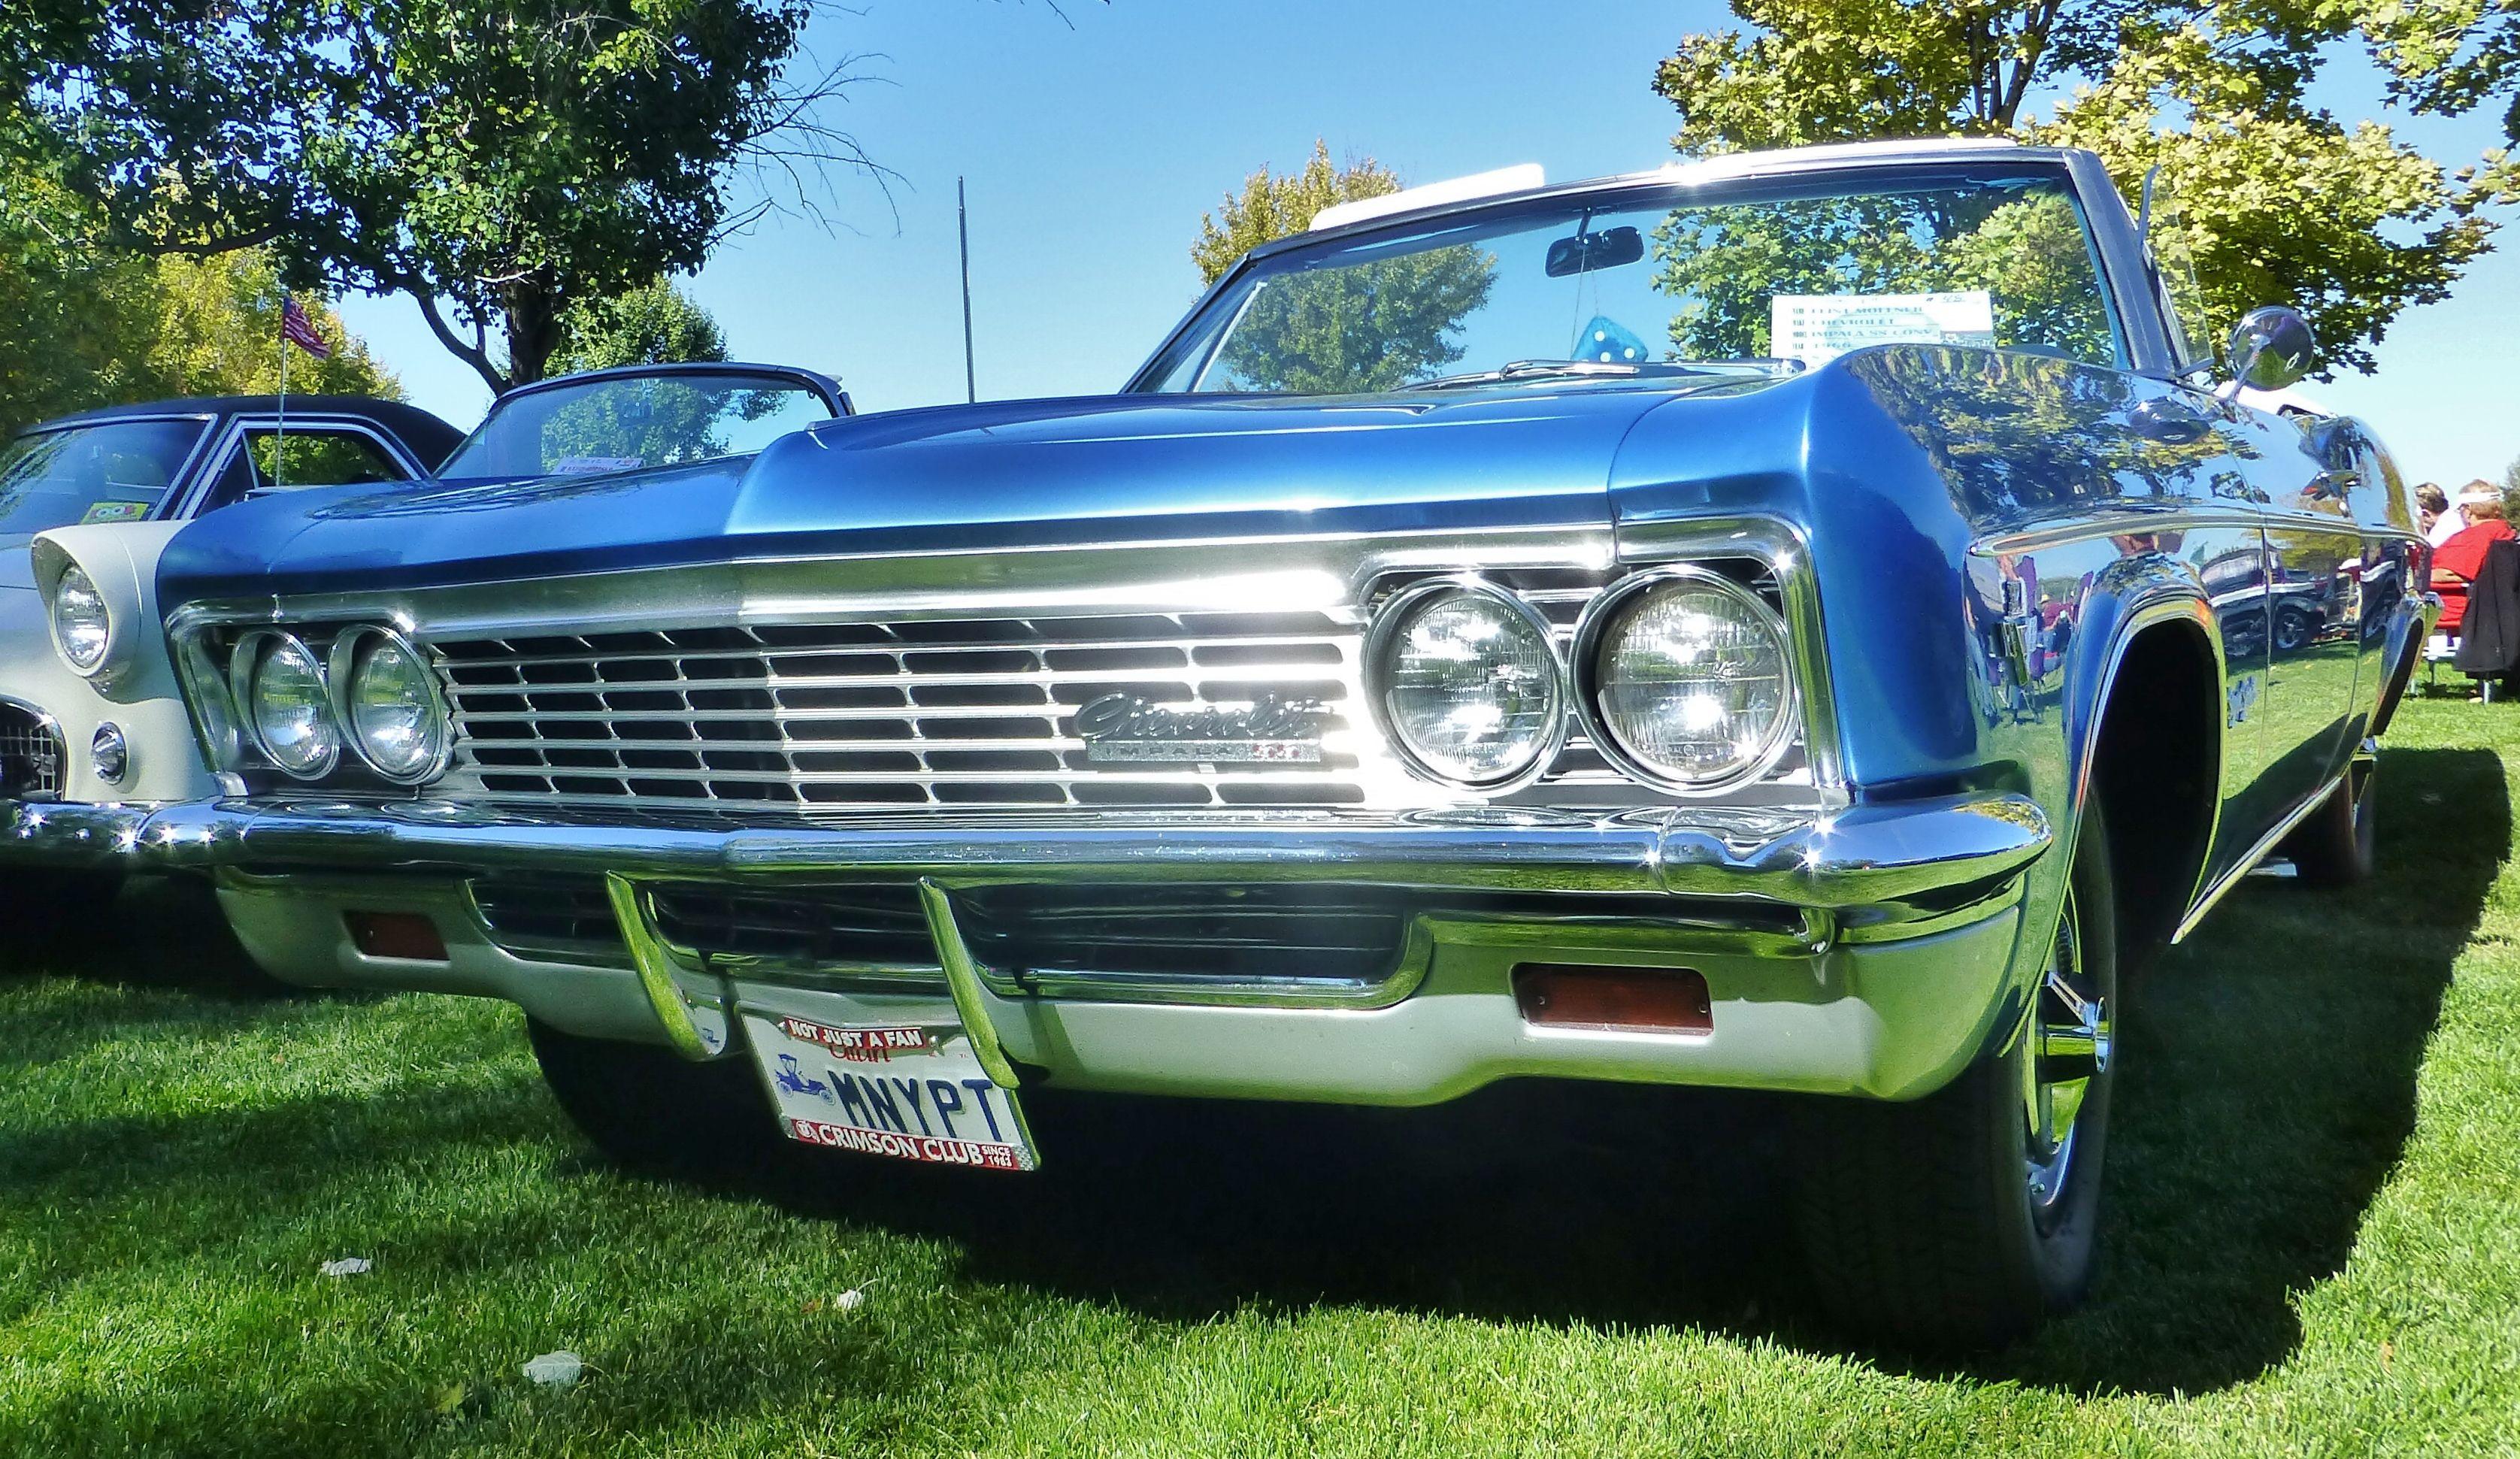 1966 Chevrolet Impala SS. Photography by David E. Nelson, 2017 ...